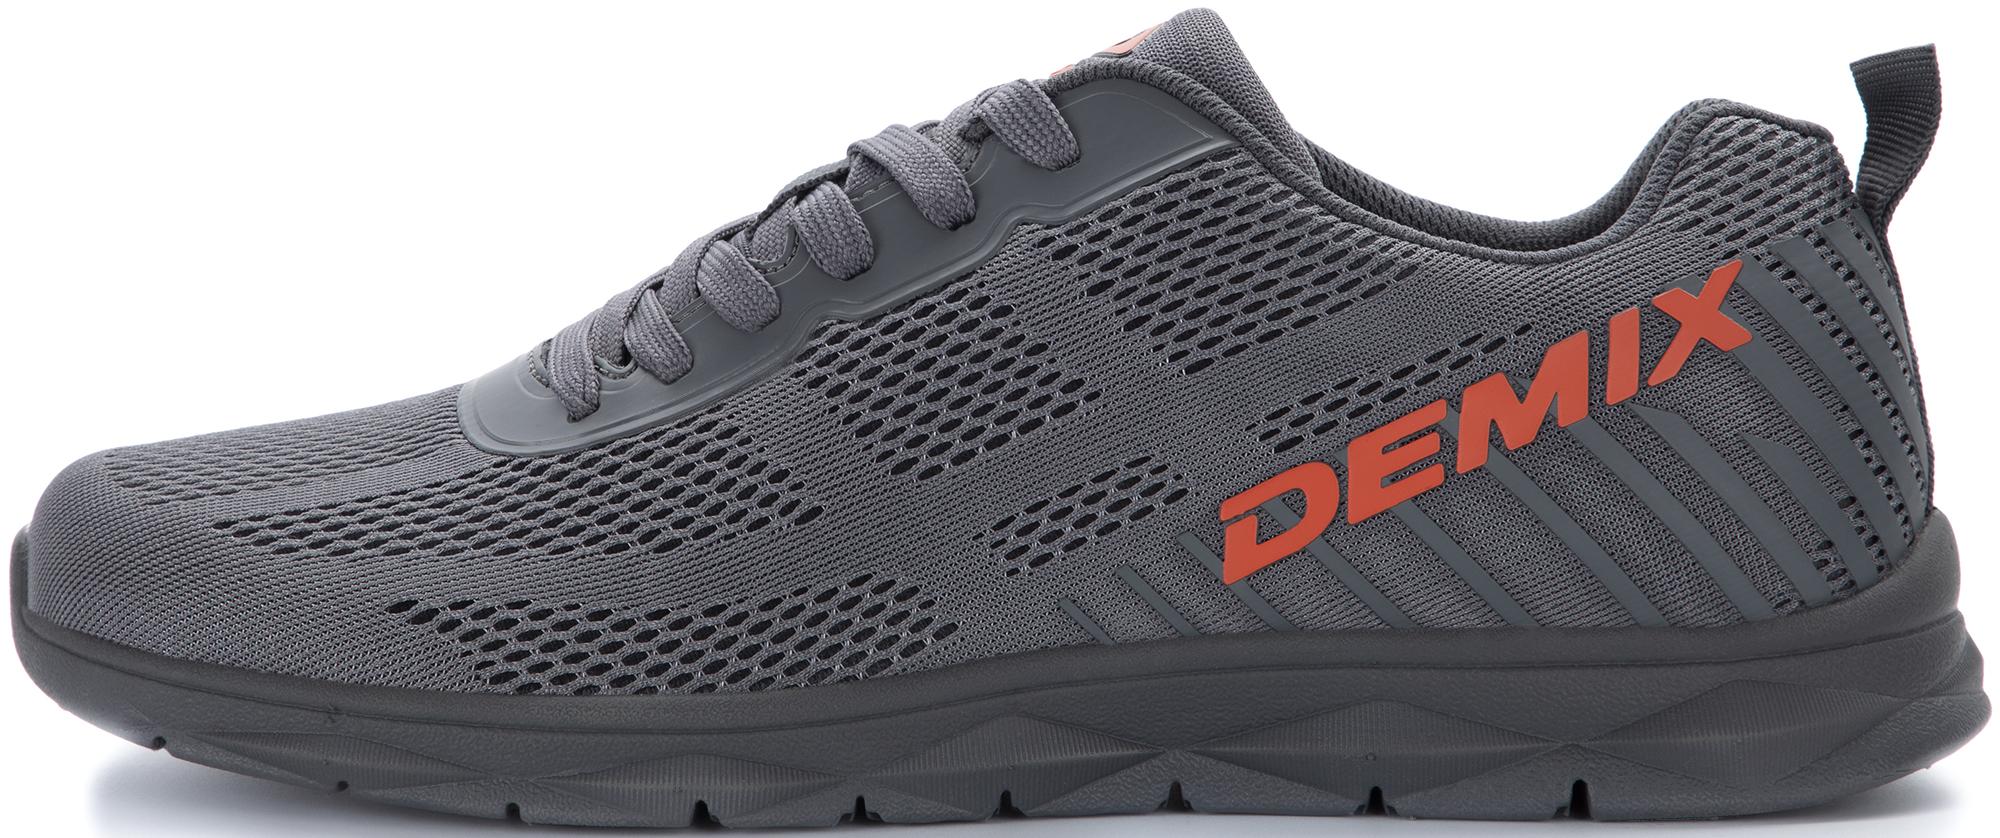 цена Demix Кроссовки мужские Demix Magus, размер 45 онлайн в 2017 году